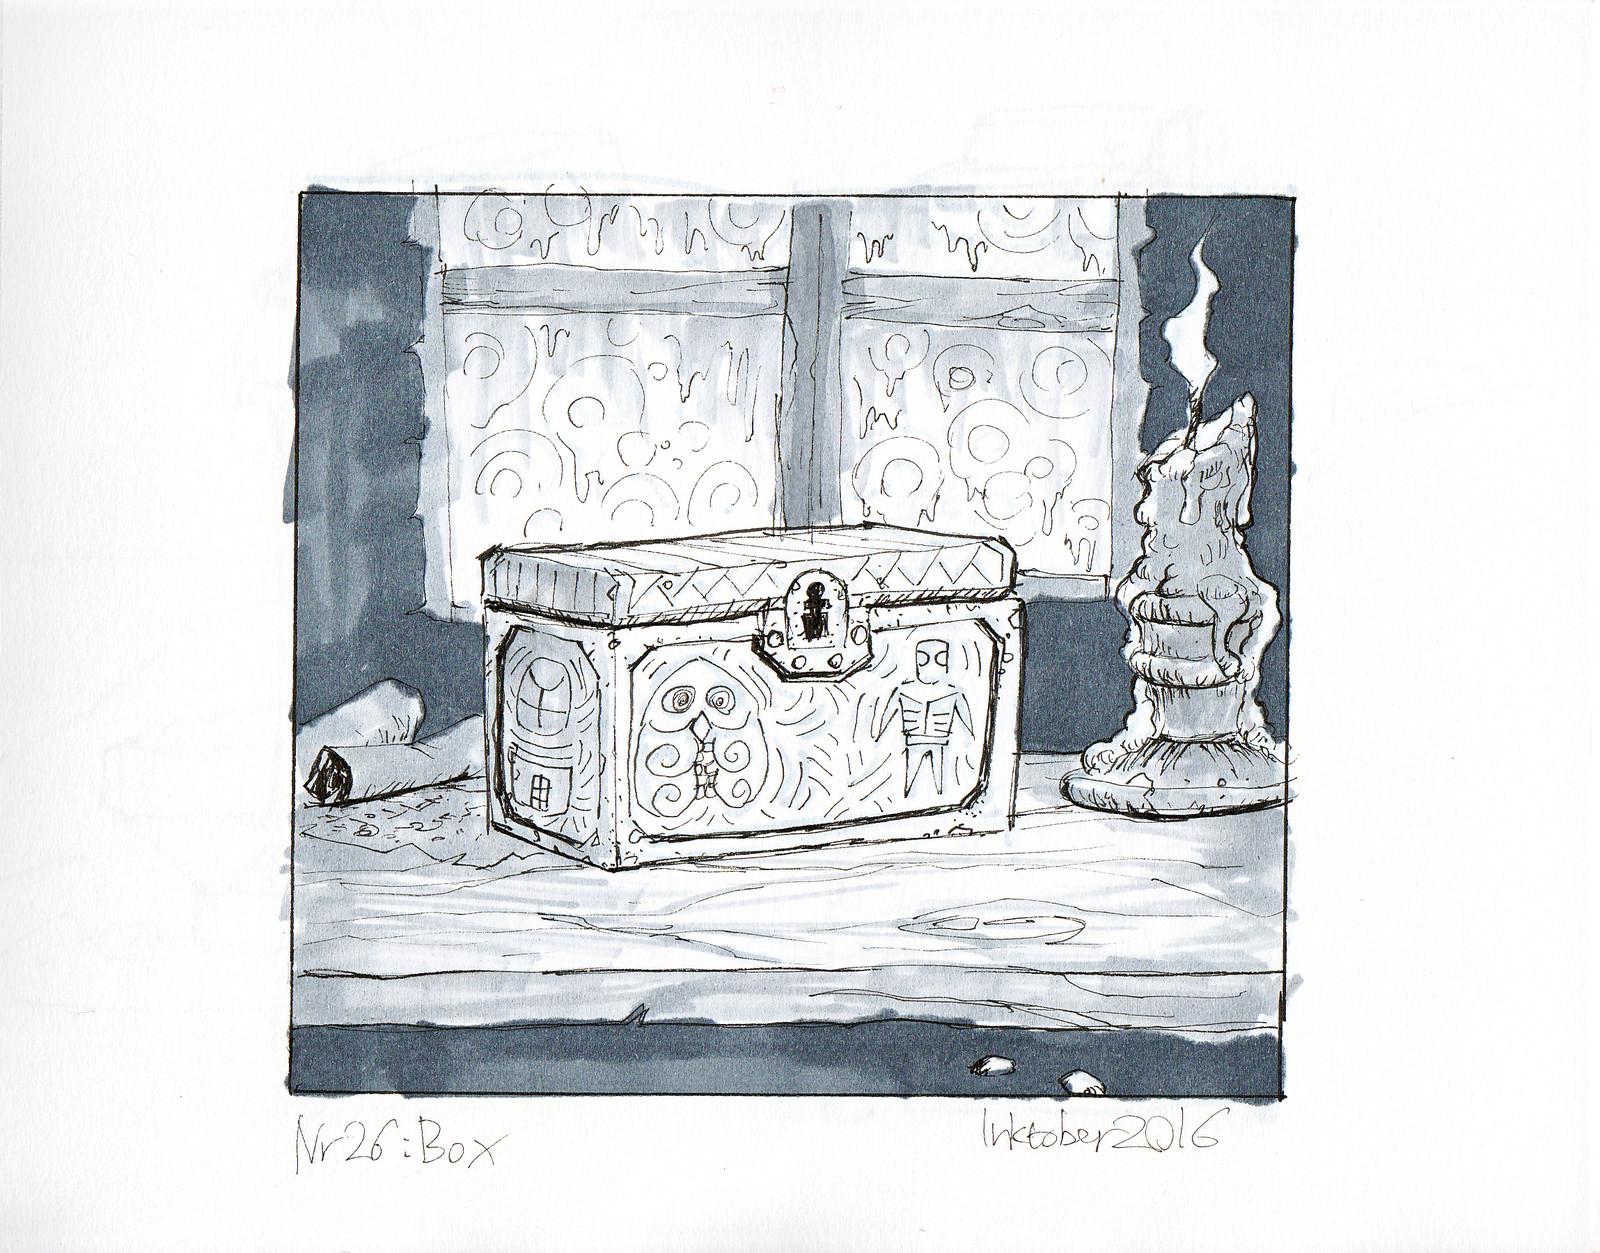 26: Box